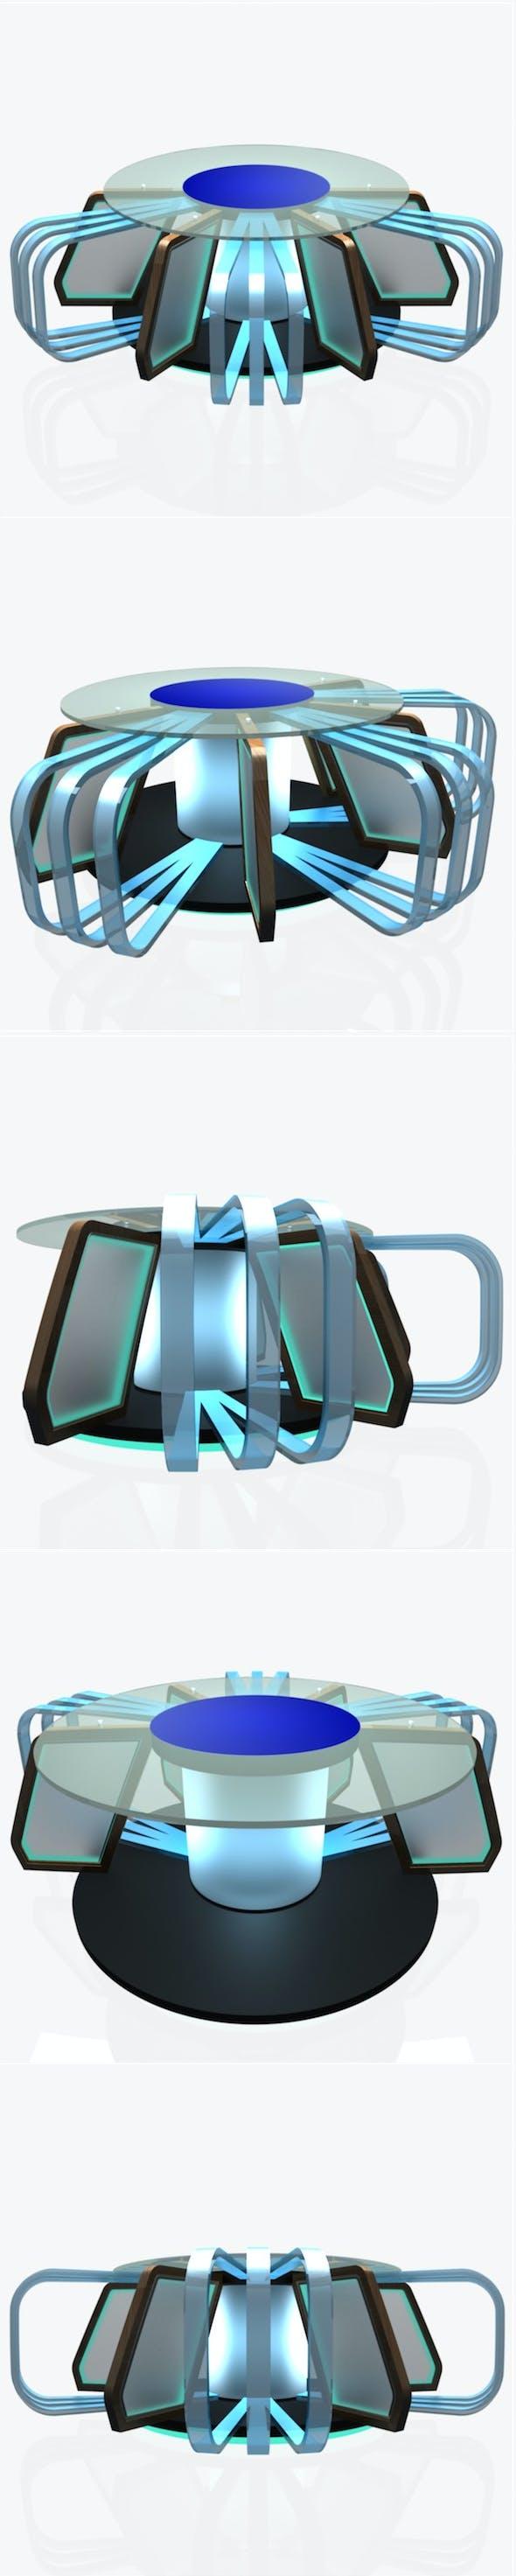 Virtual Tv Studio News Desk 7 - 3DOcean Item for Sale